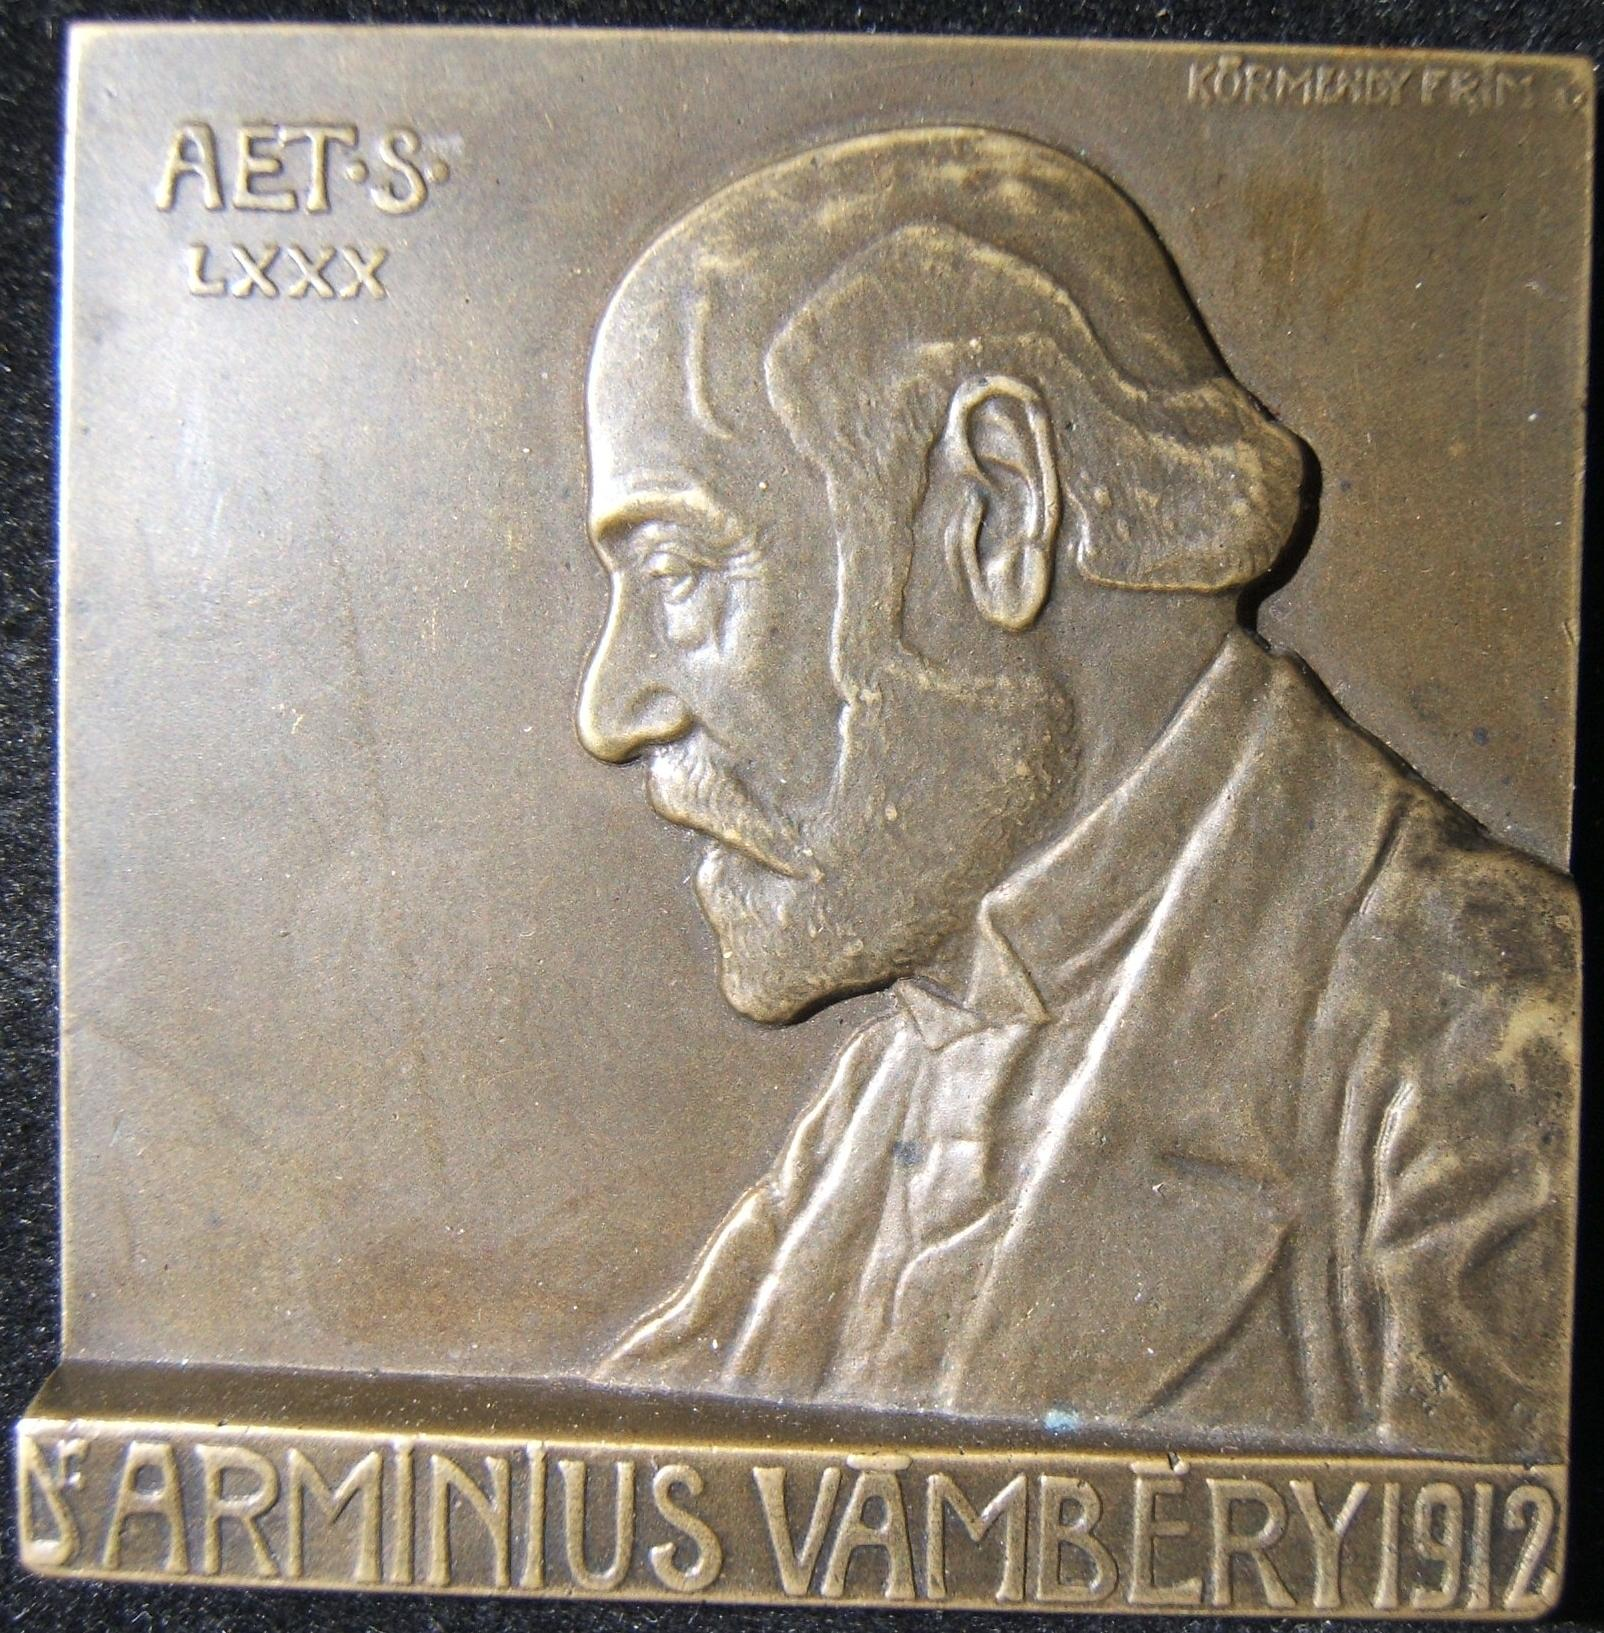 Hungarian Dr. Armin Vambery 80th birthday Judaica plaquette, 1912 by Kormendi